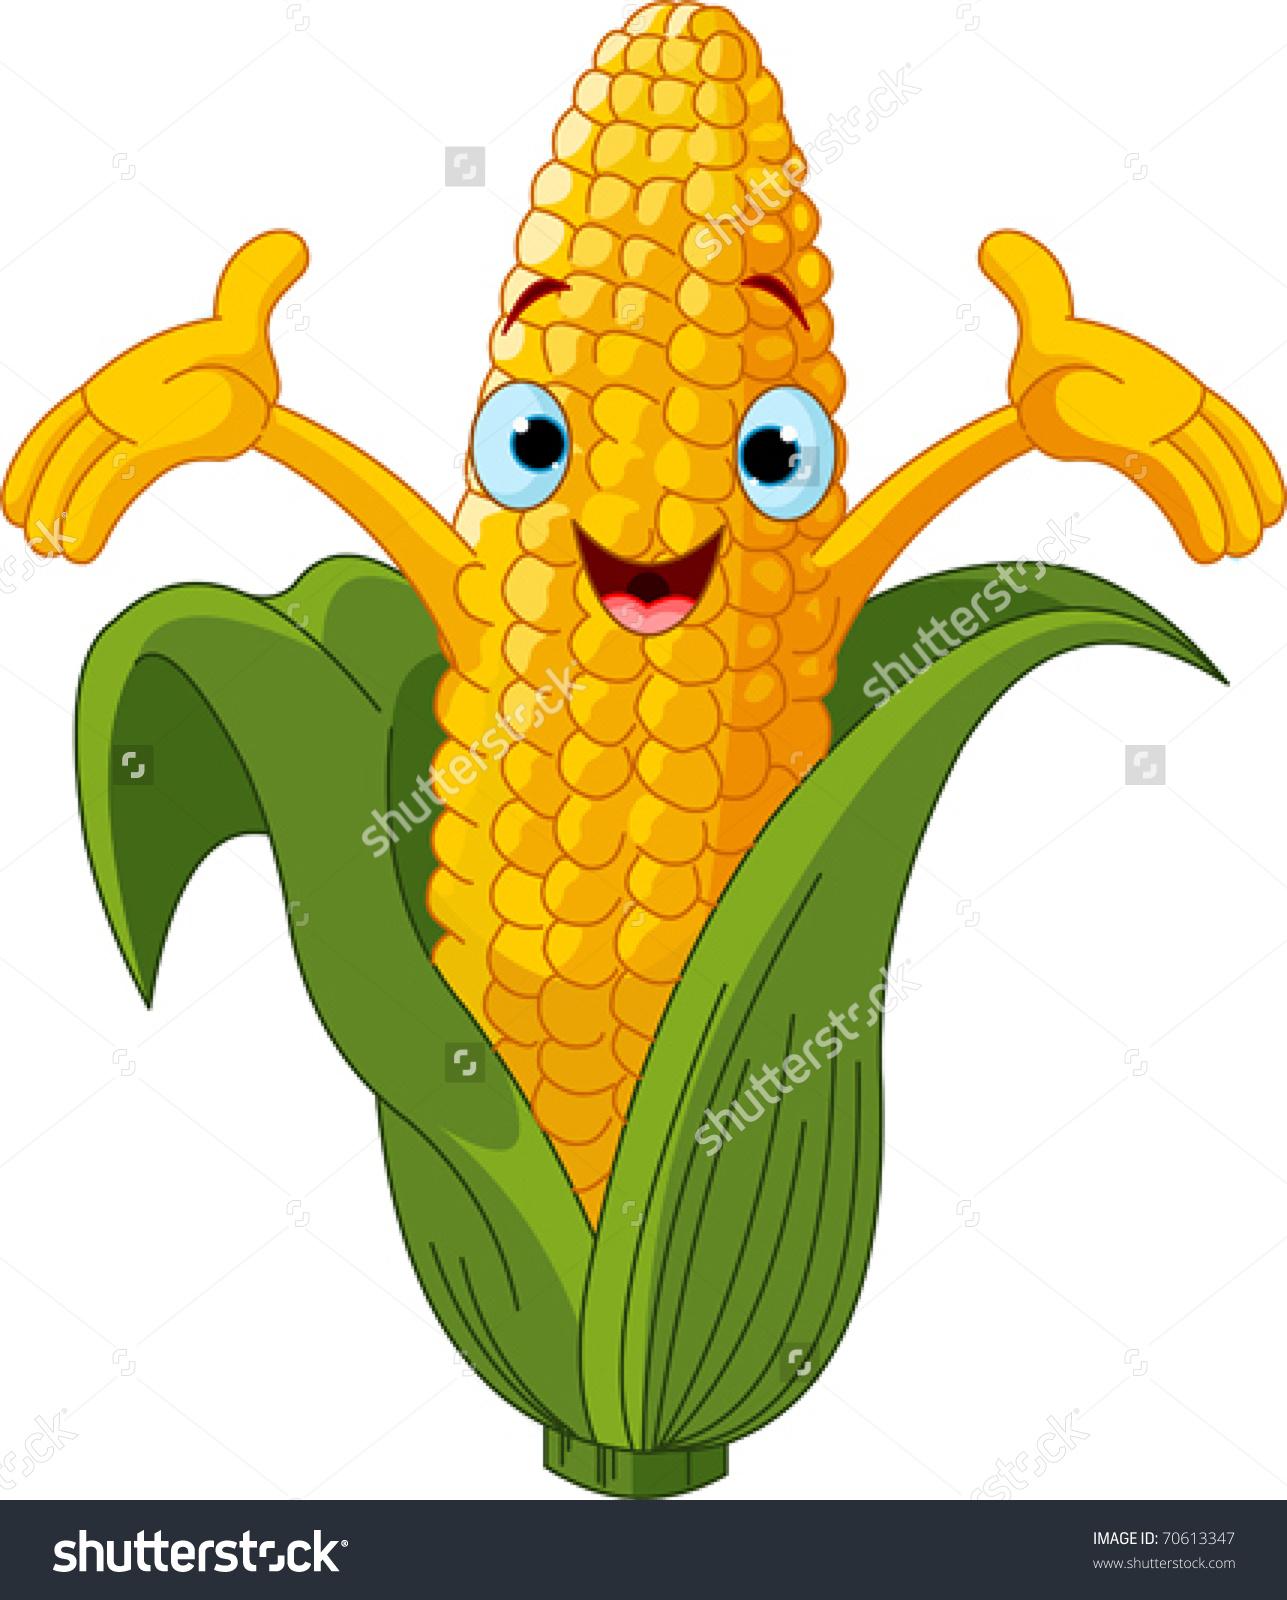 Illustration Sweet Corn Character Presenting Something Stock.